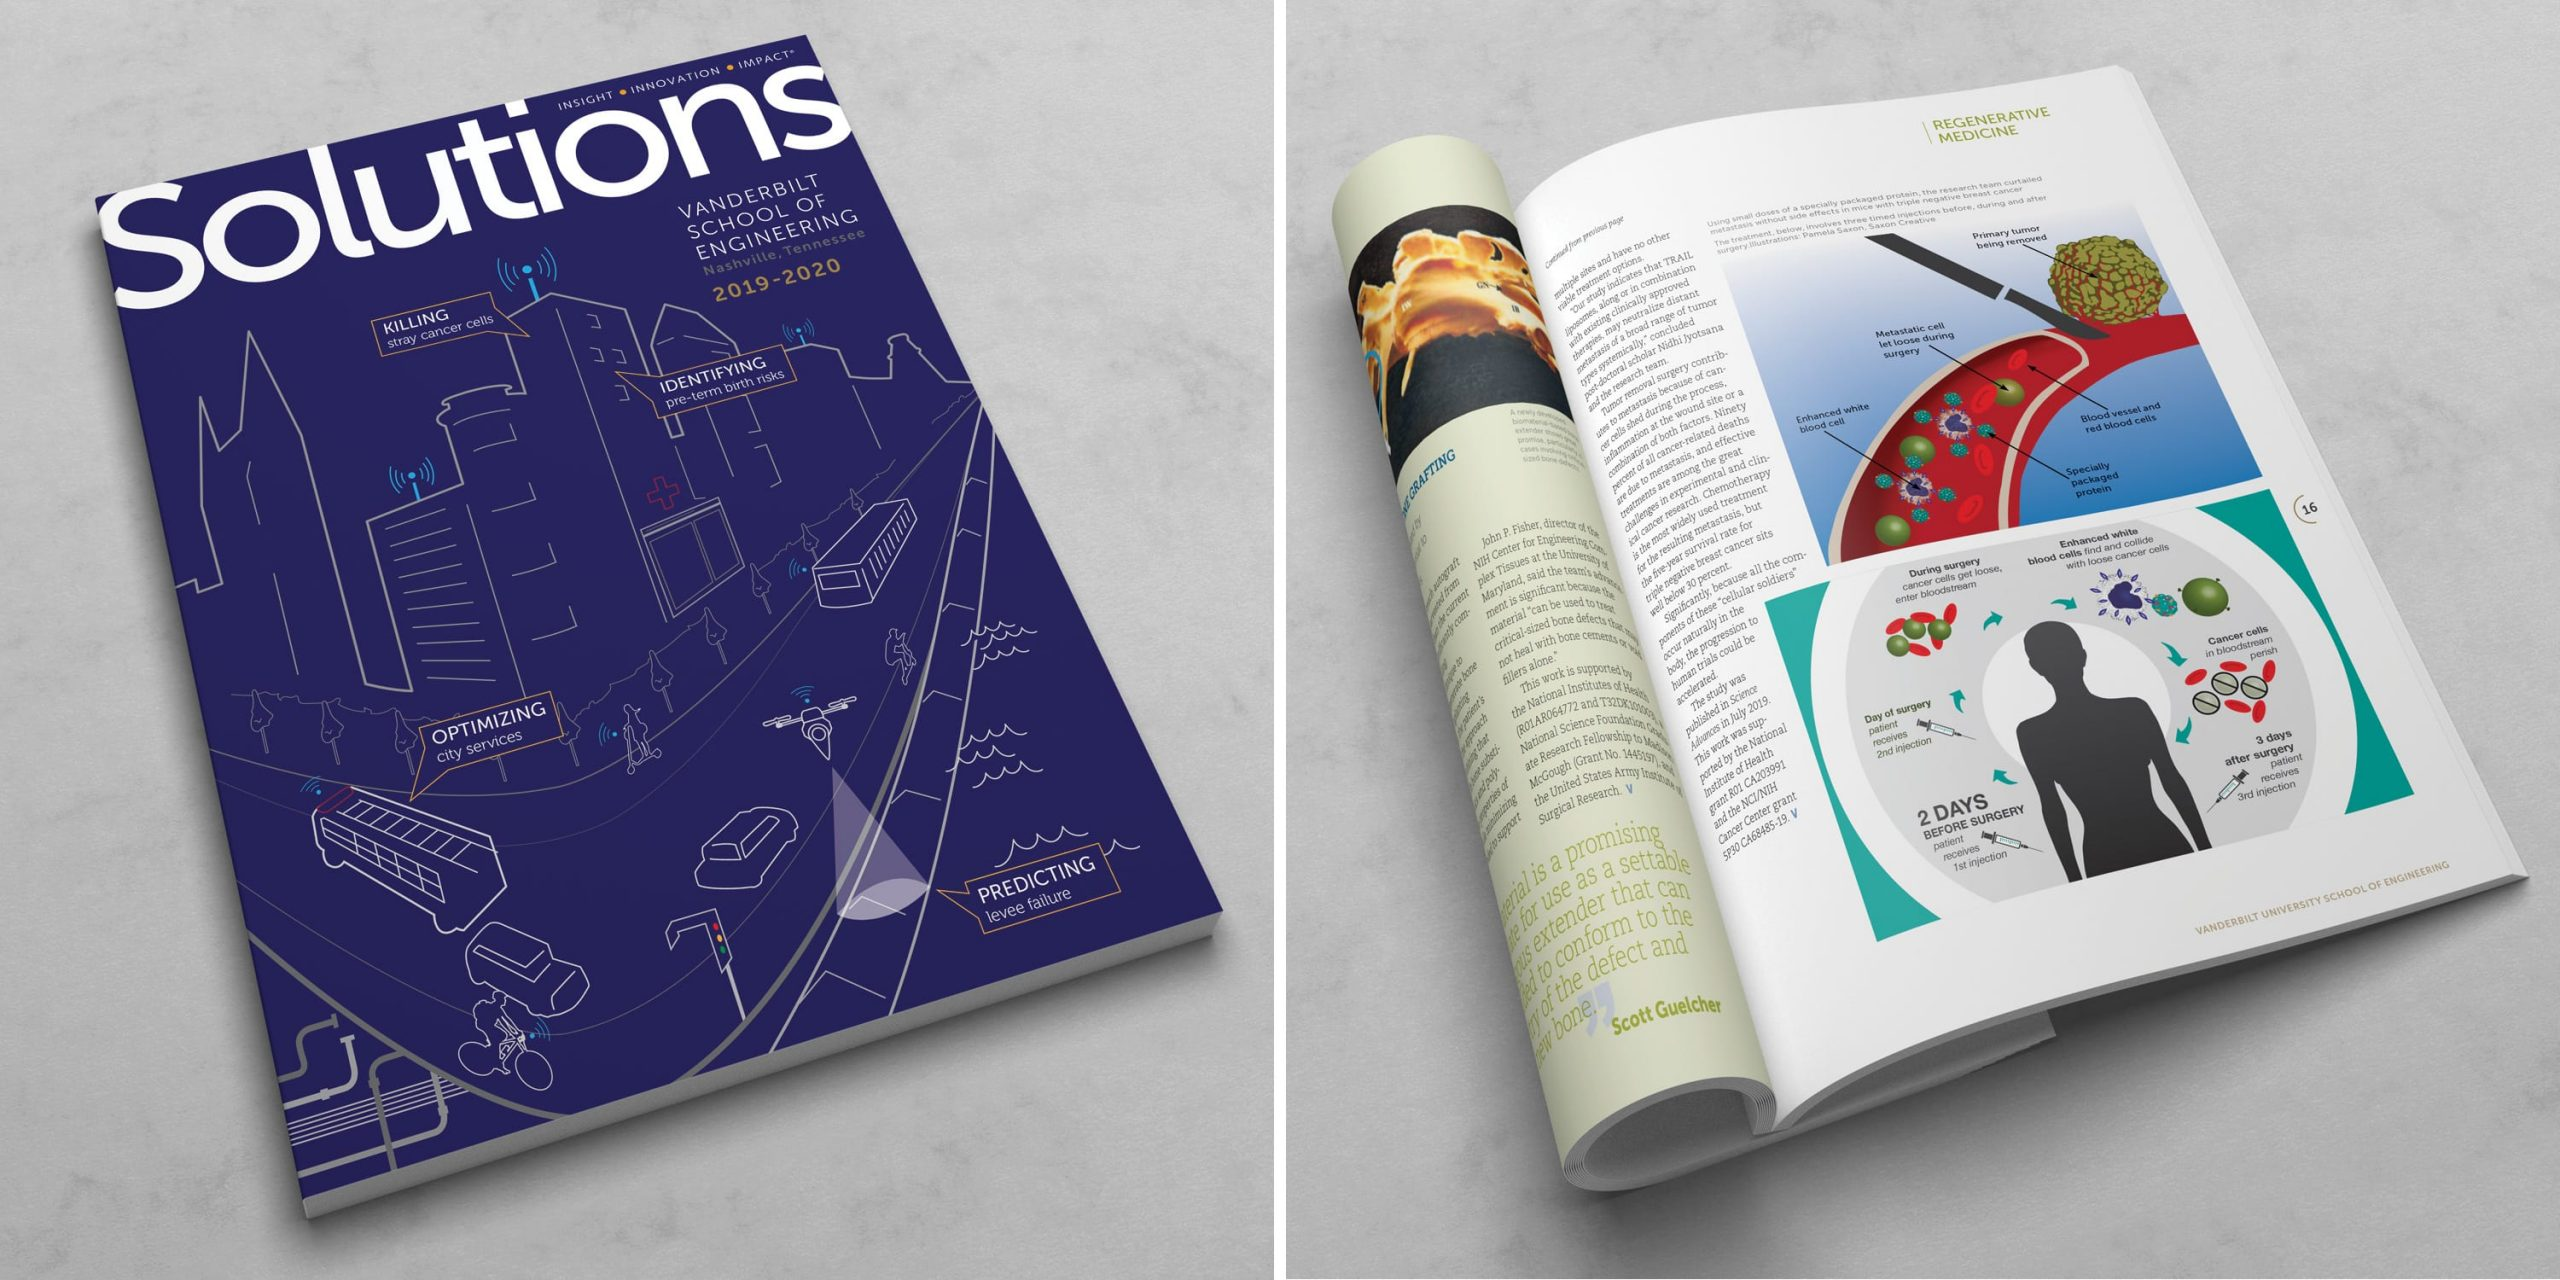 Vanderbilt University Solutions Magazine: Smart Cities